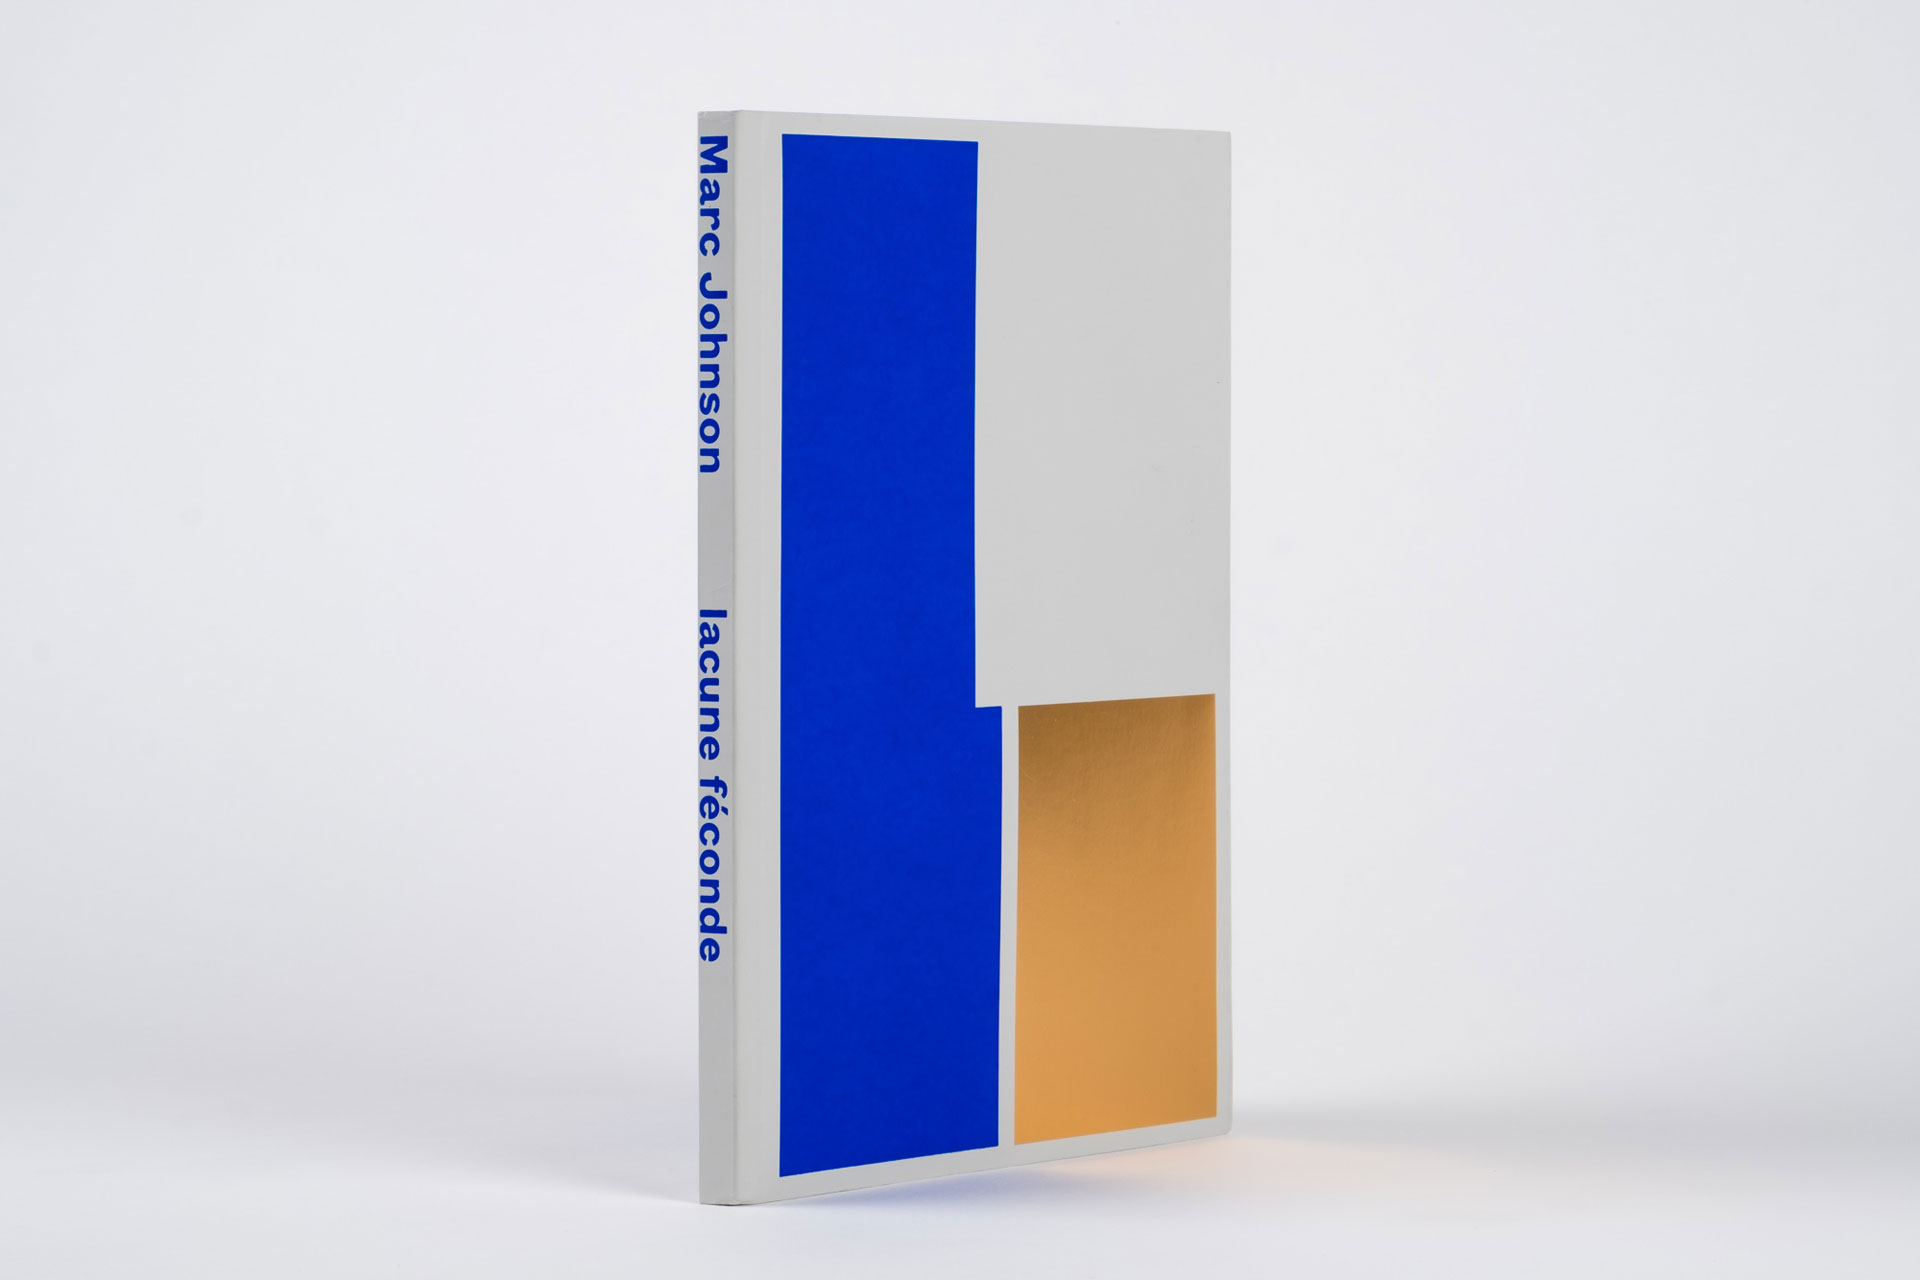 lacune féconde, fecund lacuna artist book by Marc Johnson